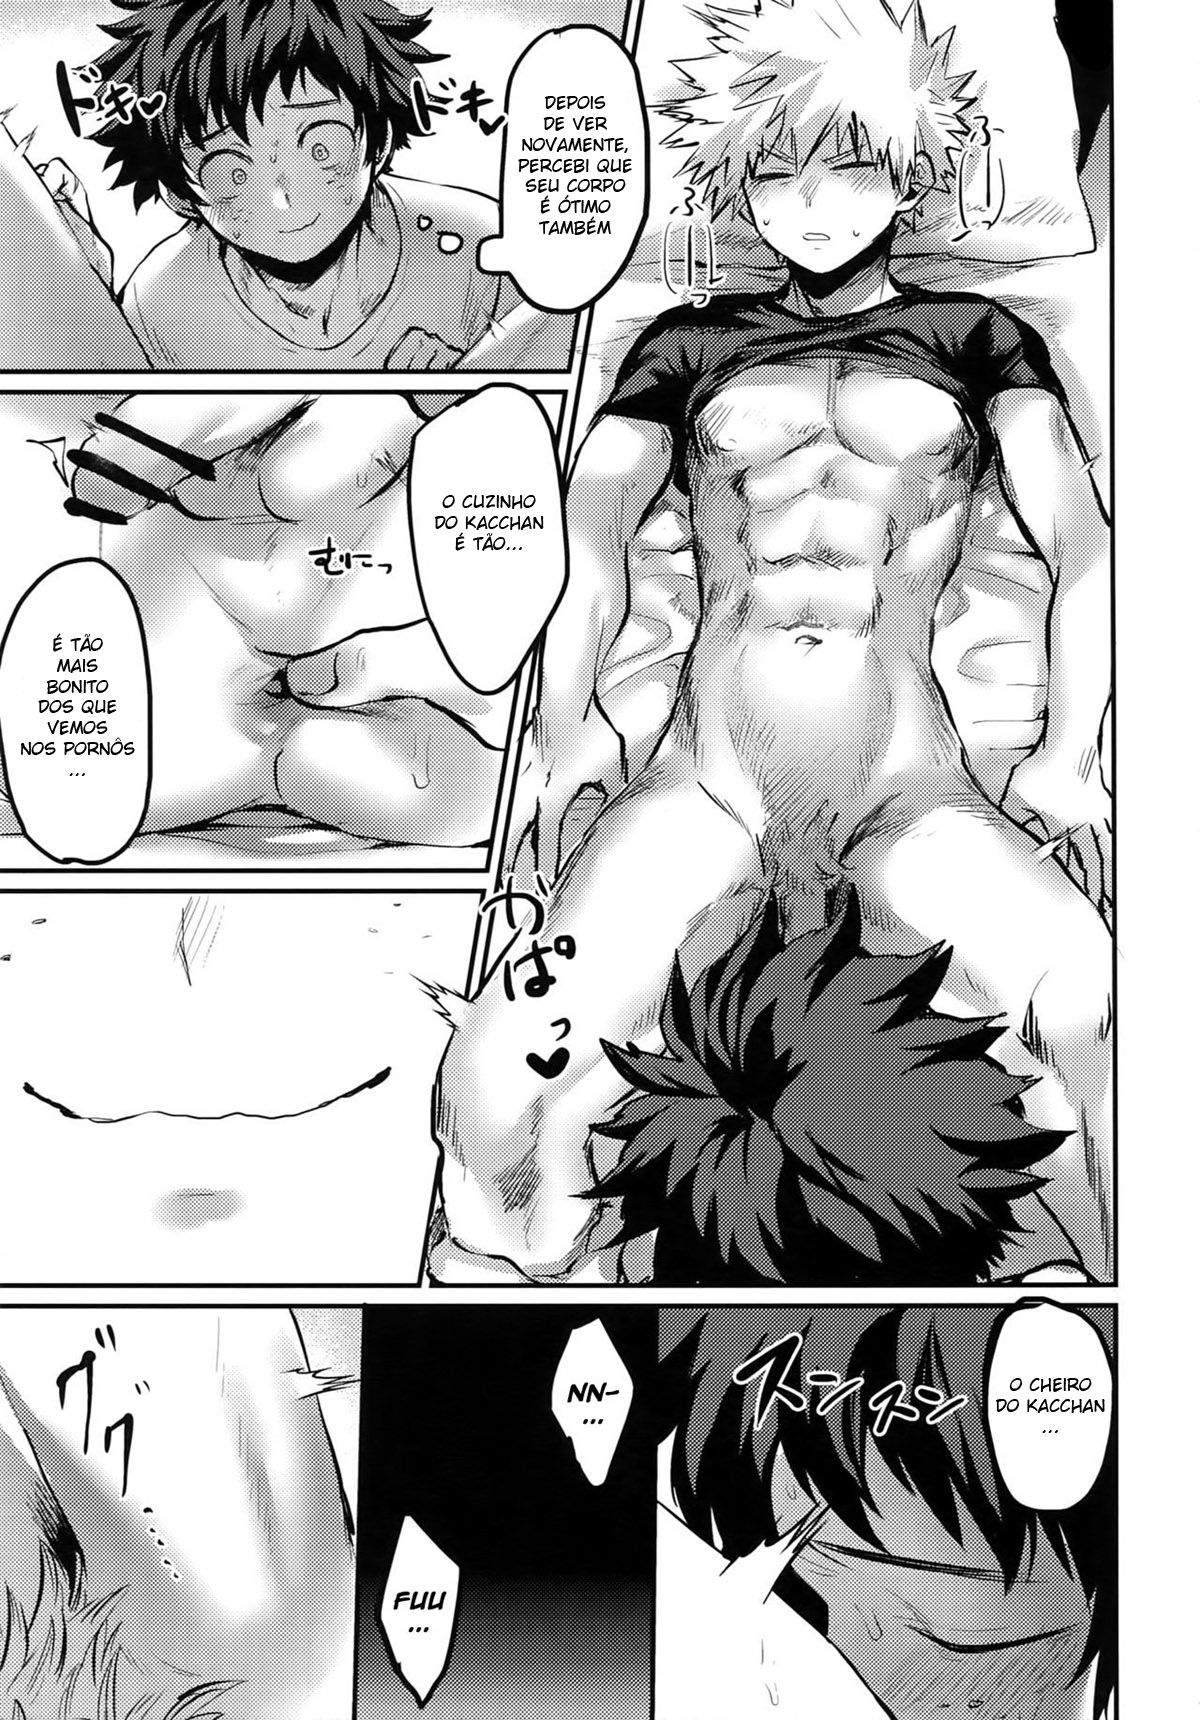 Sexo Yaoi